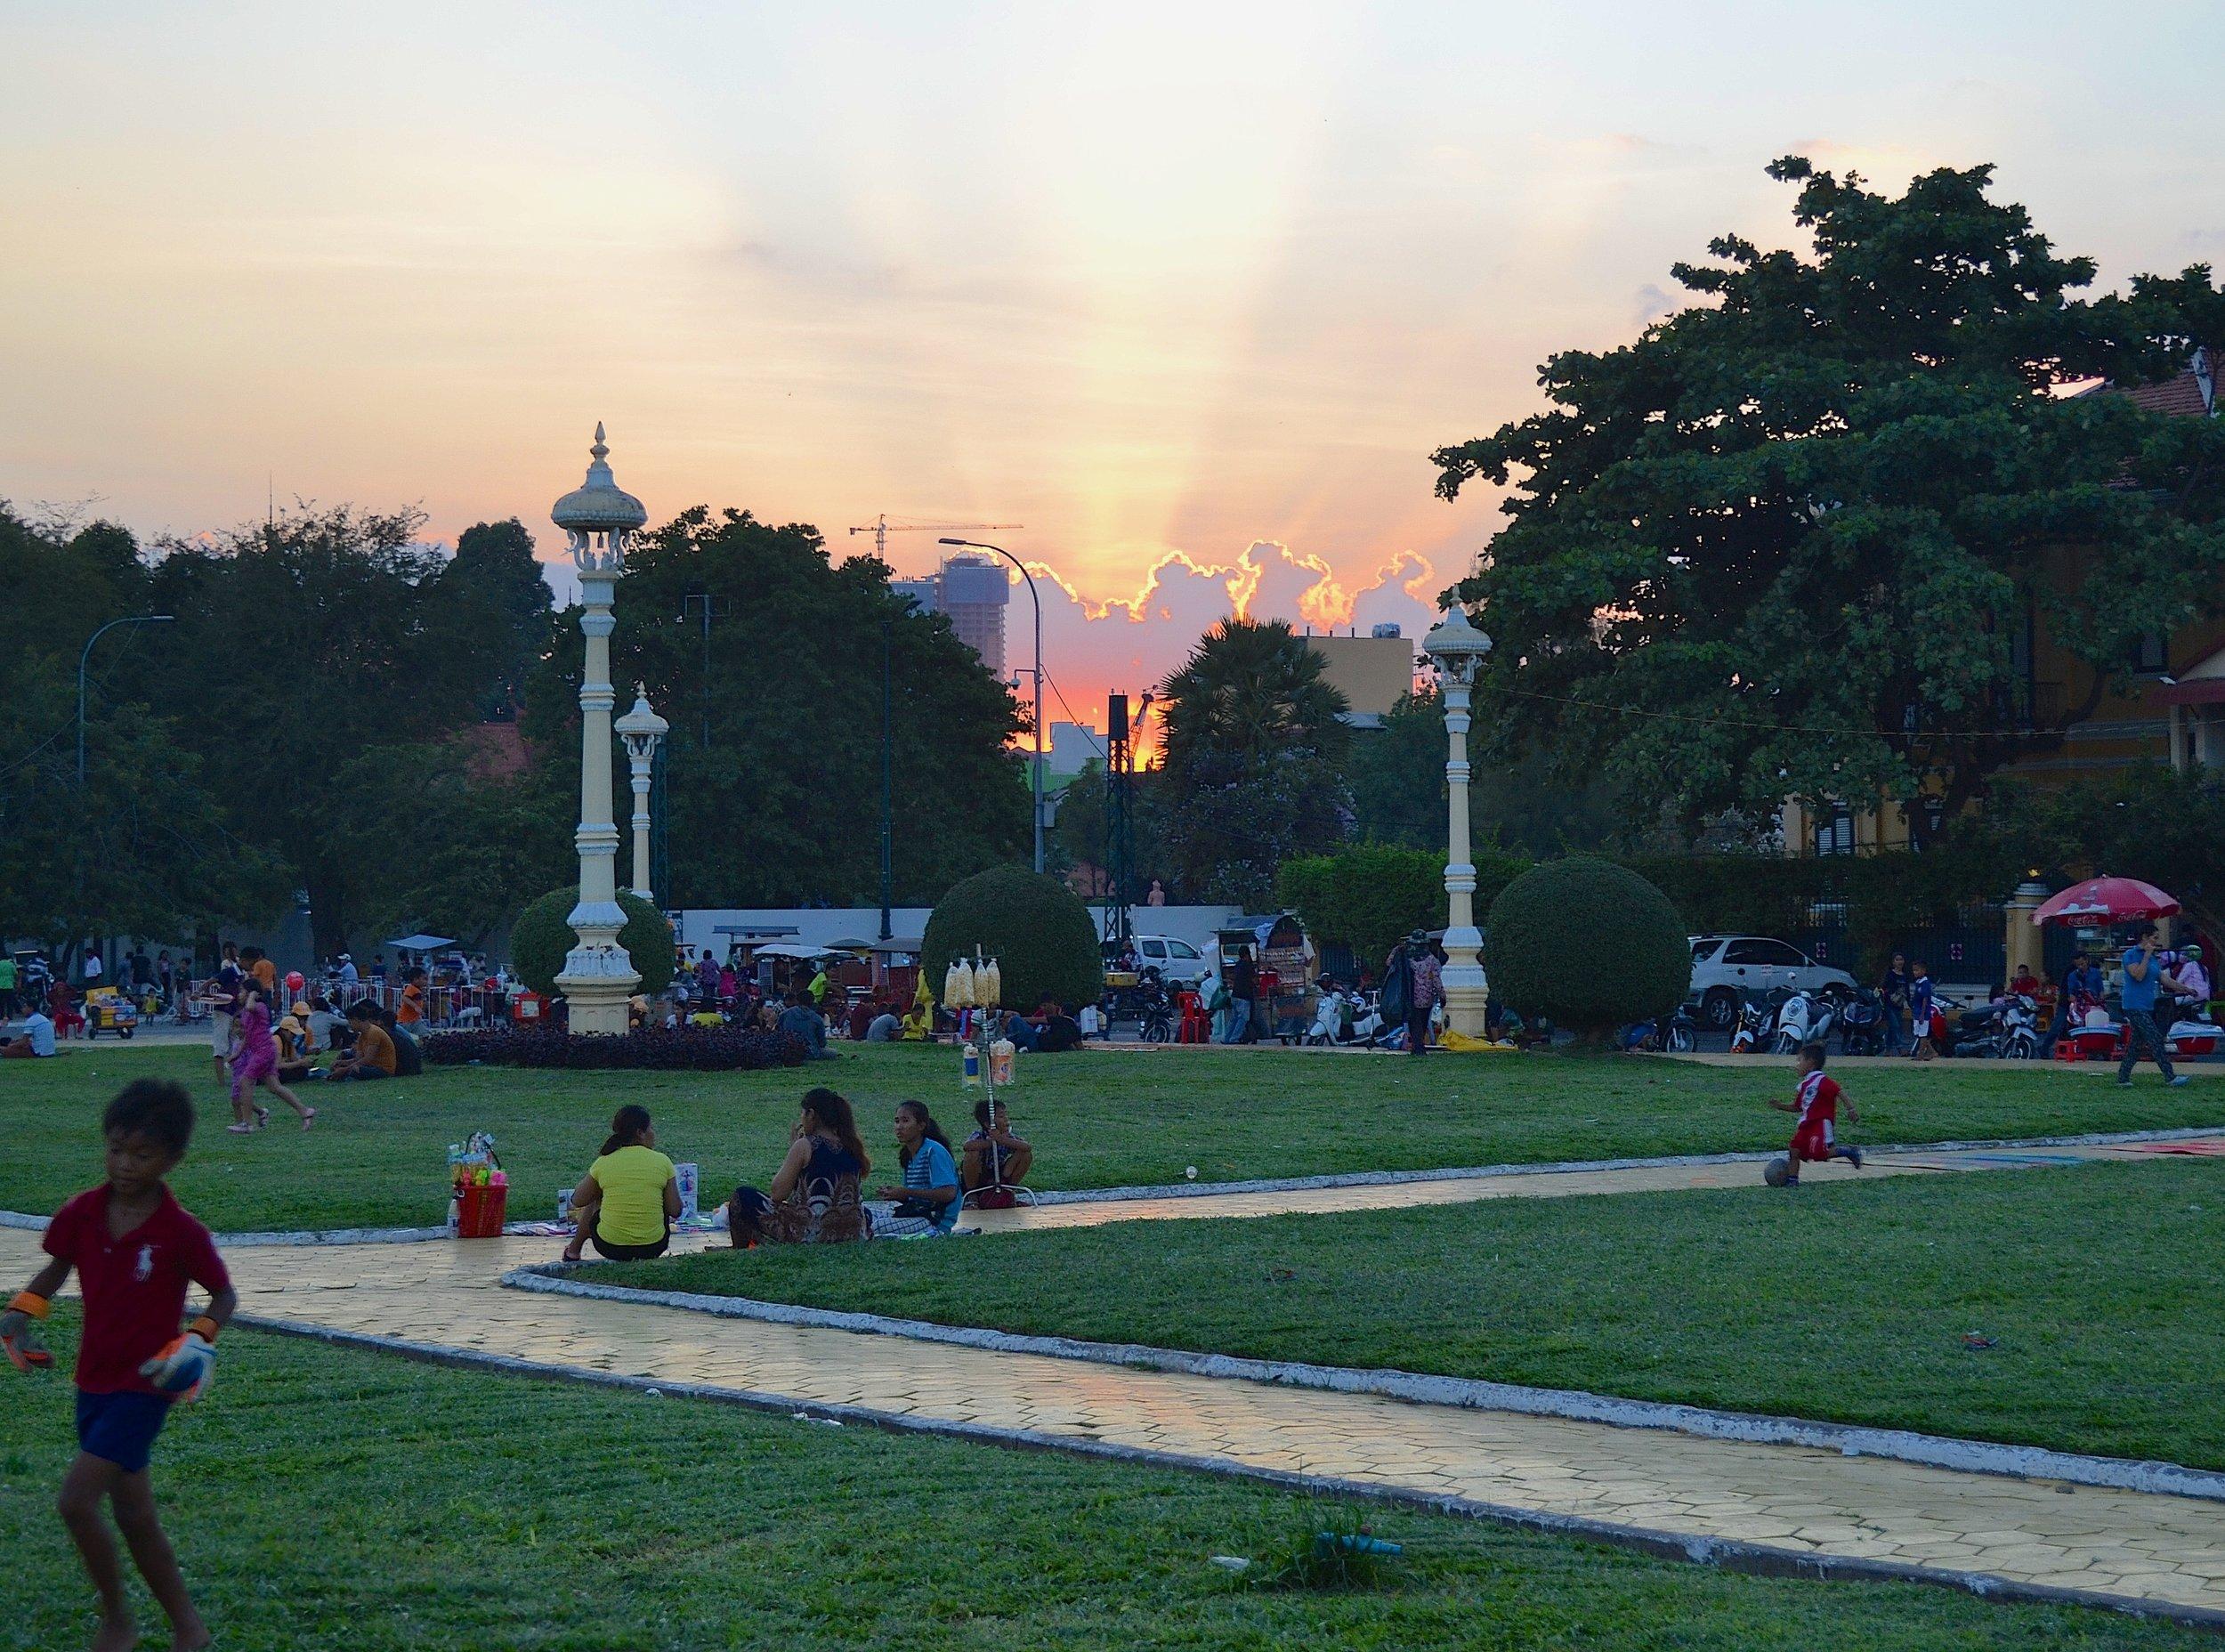 Last night's sunset in Phnom Penh. Photo cred: me